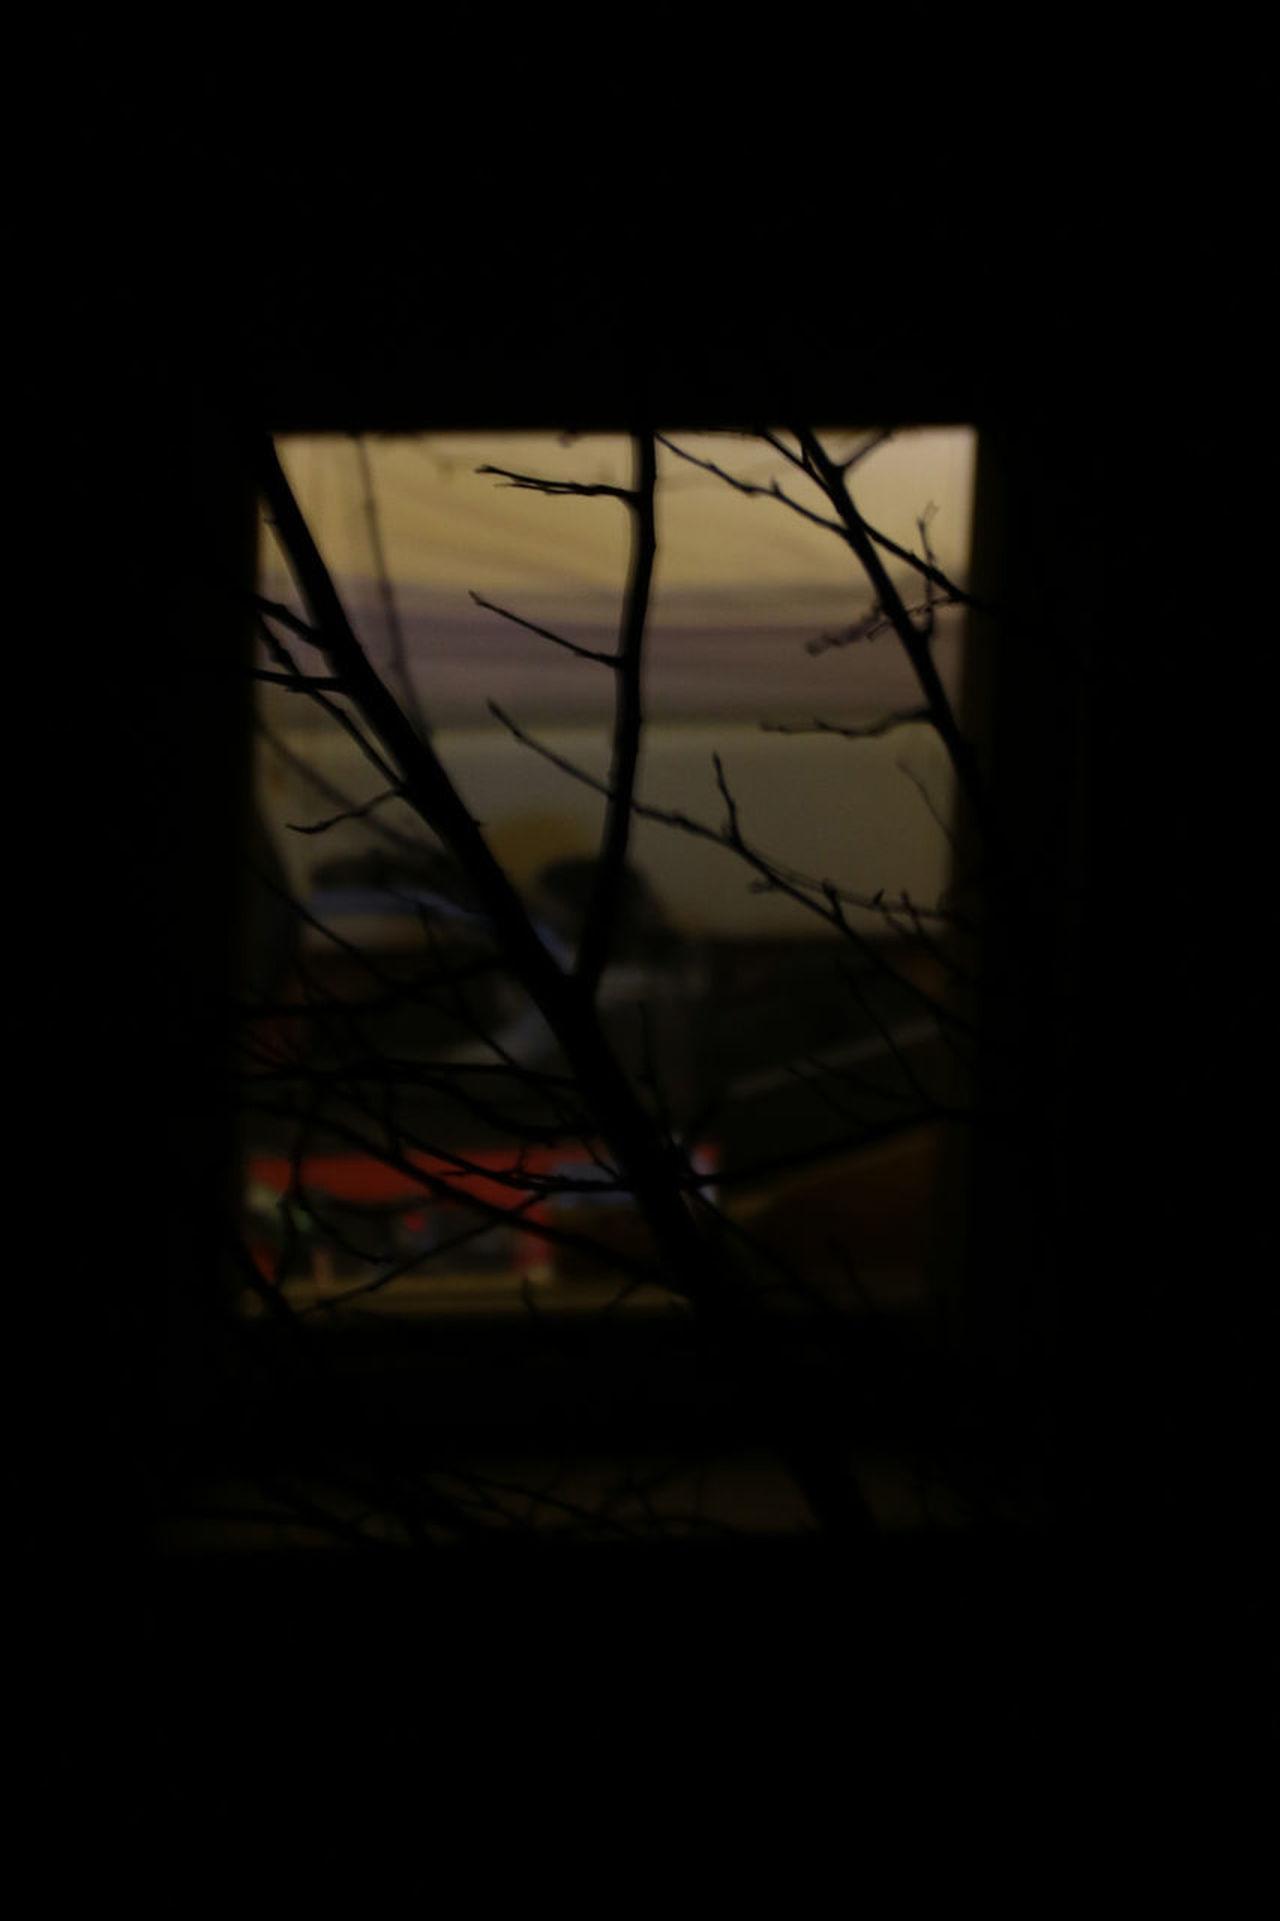 Almost Painting Indoors  Night Night Lights Night Photography Night View Nightphotography Nightshot No People Window